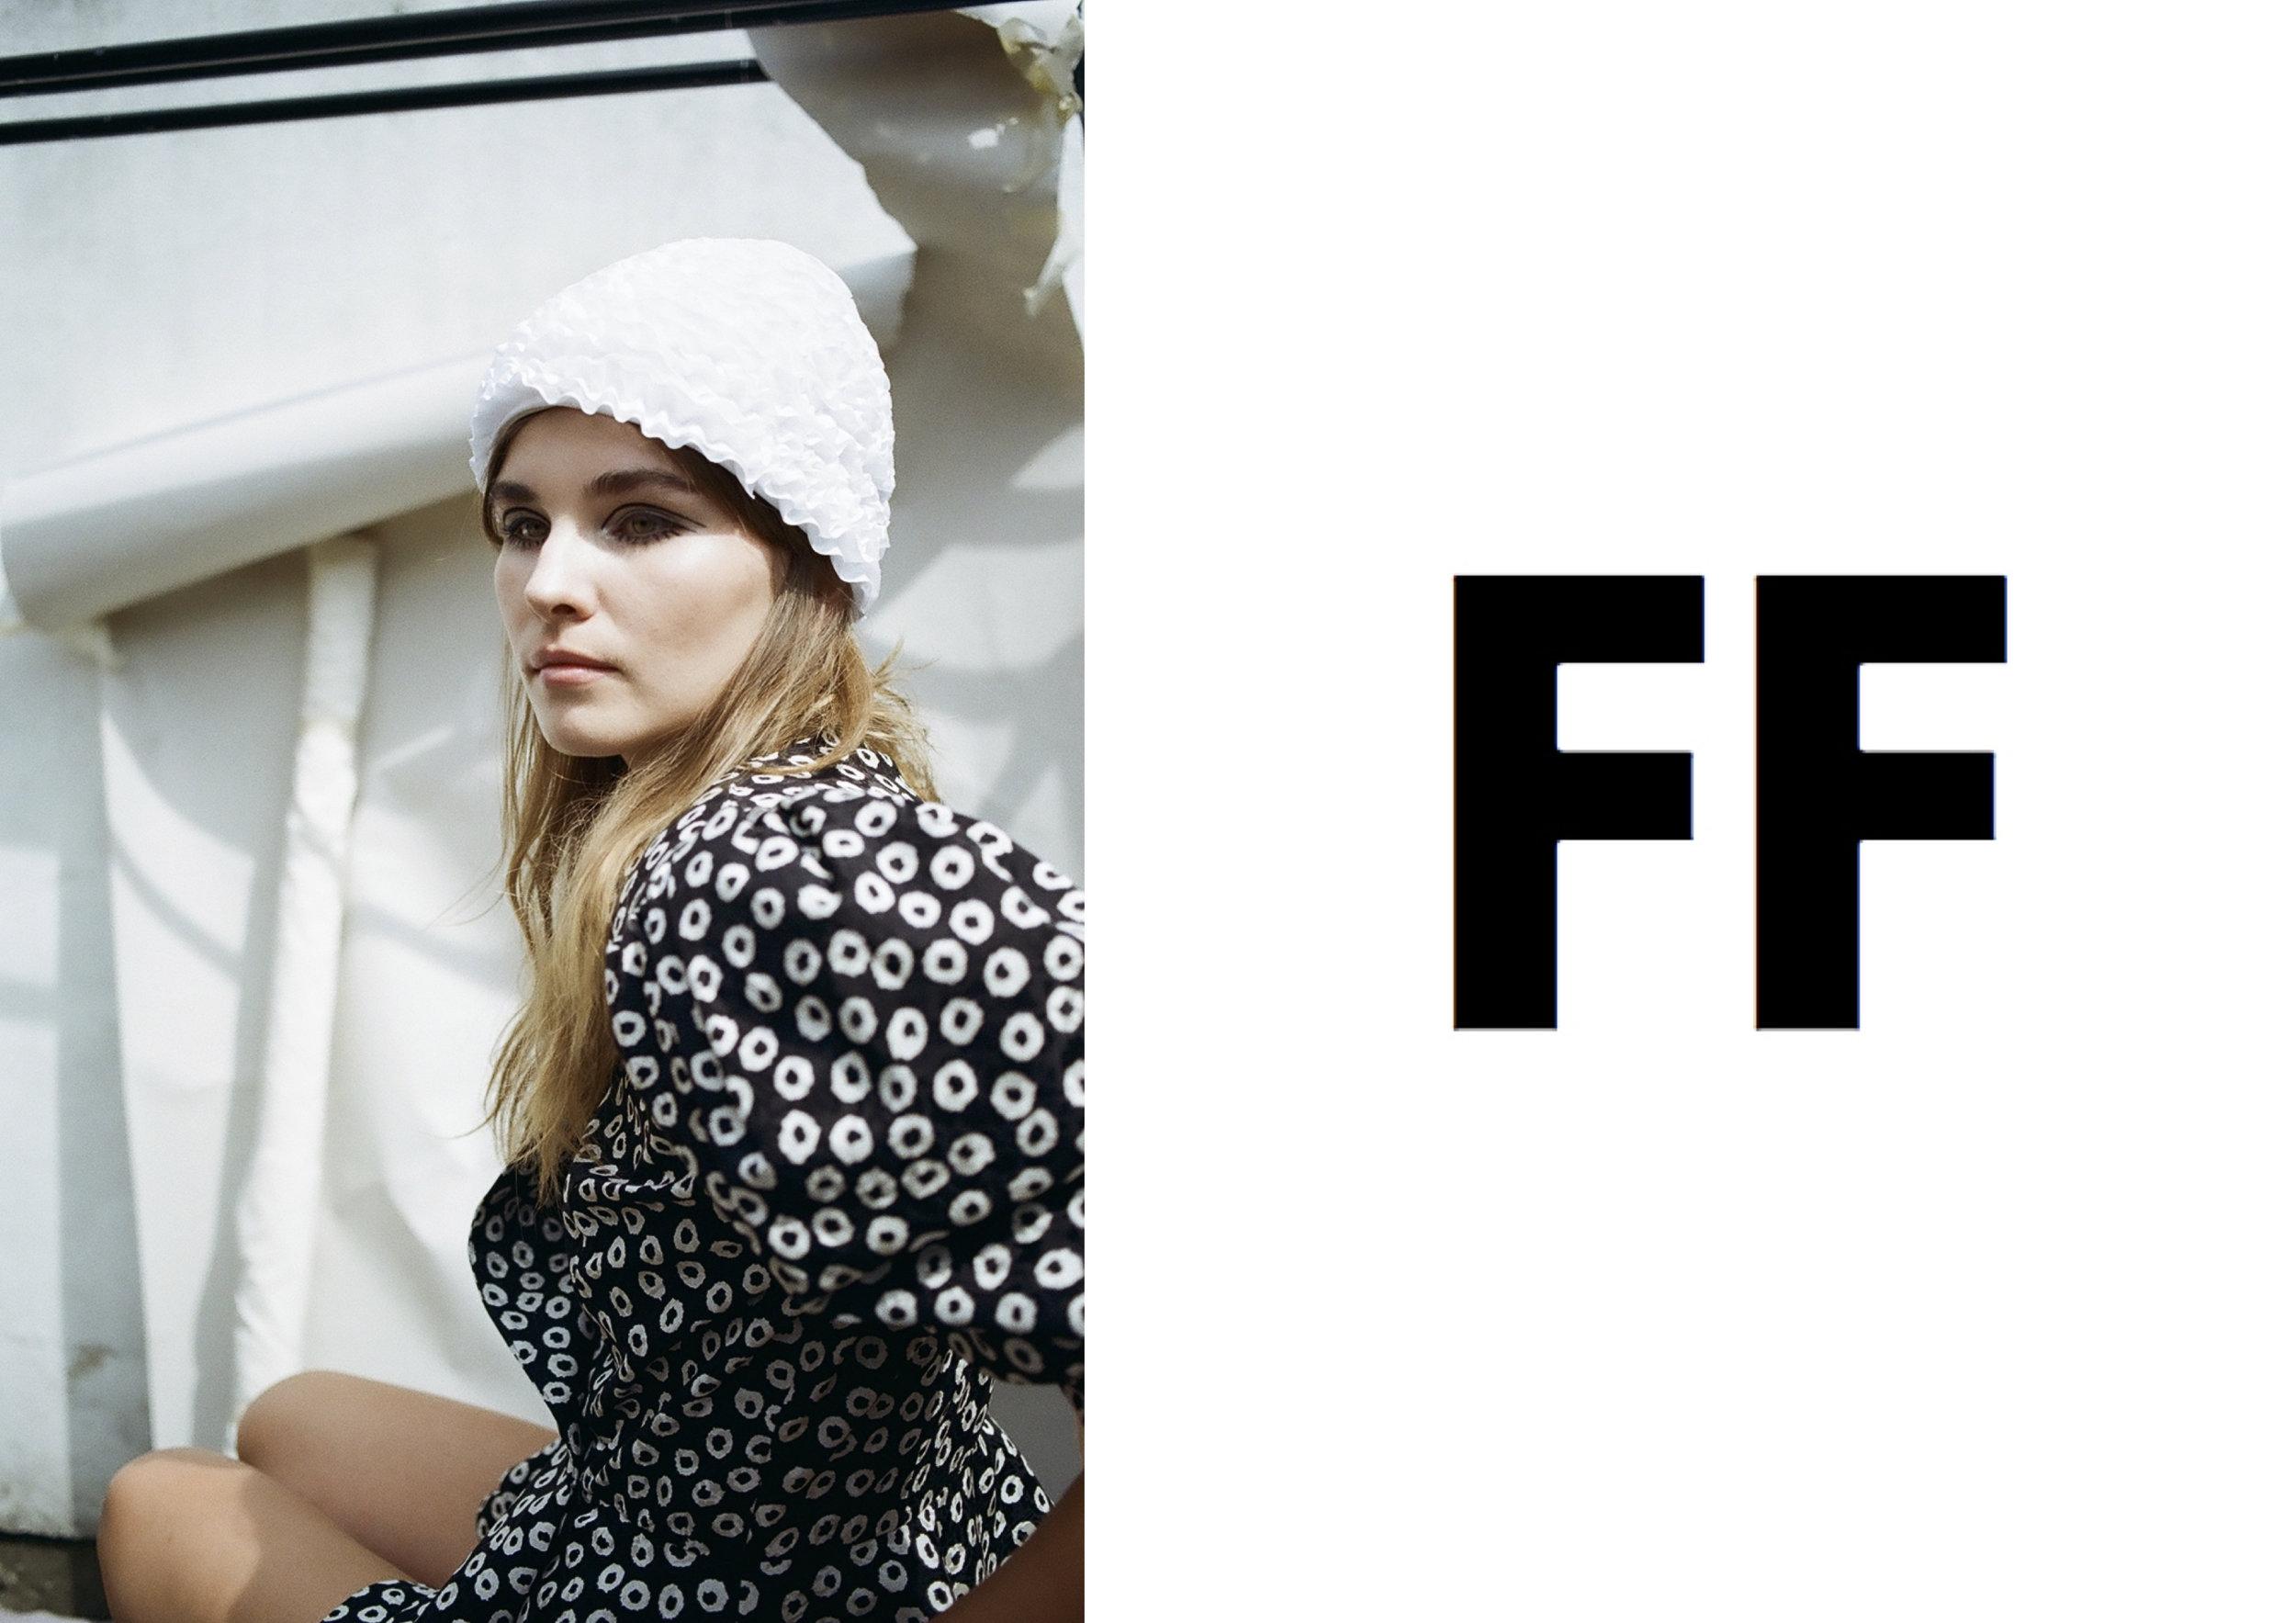 French Fries Magazine